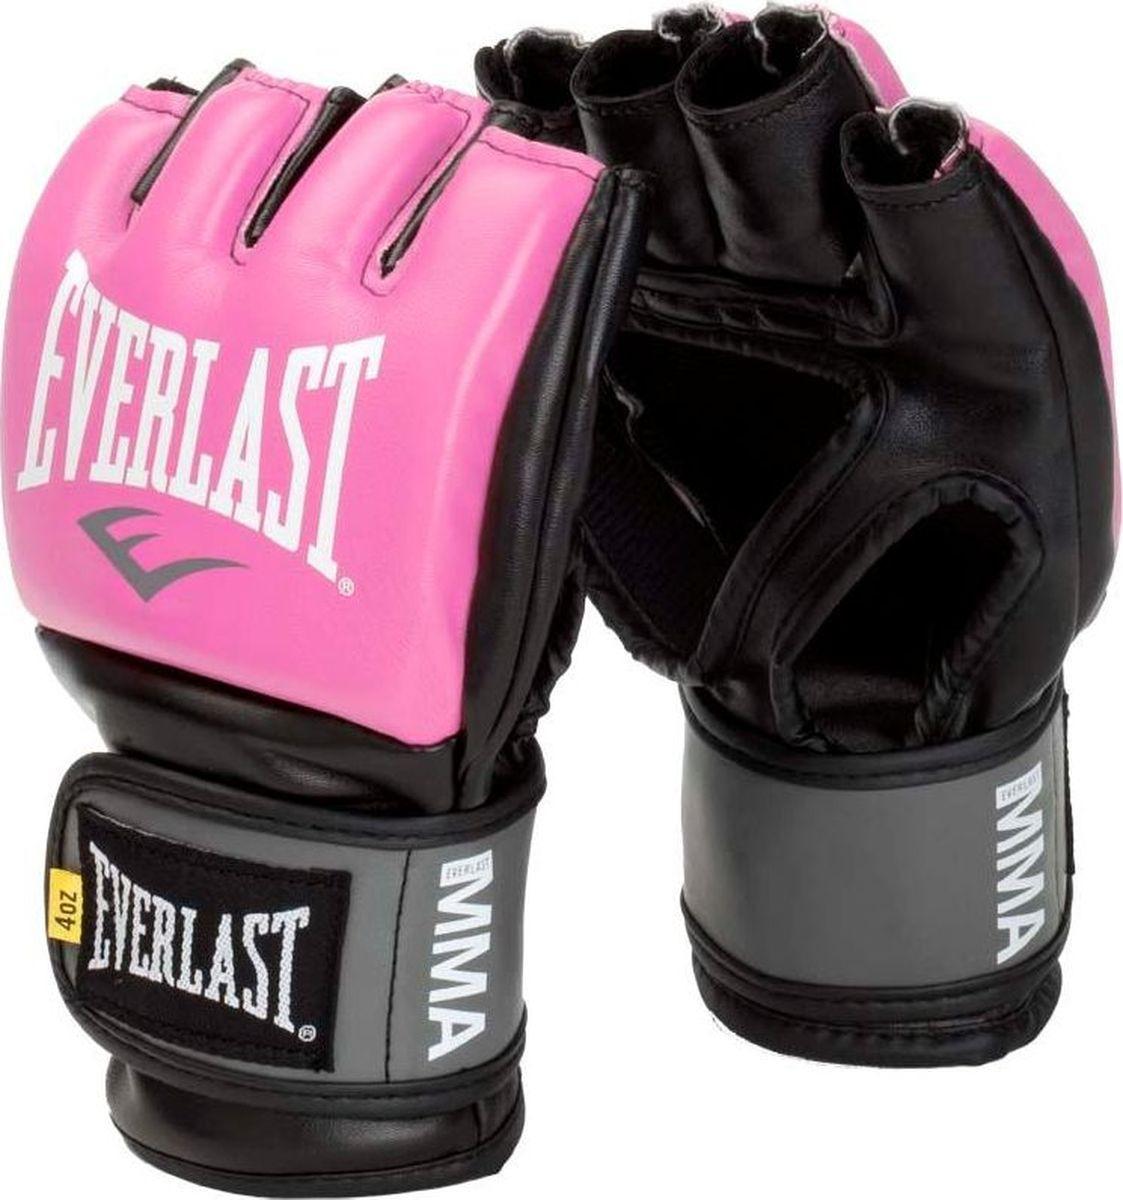 Перчатки для единоборств Everlast Pro Style Grappling, тренировочные, 7778PLXLU, розовый, размер L/XL перчатки тренировочные everlast pro style elite